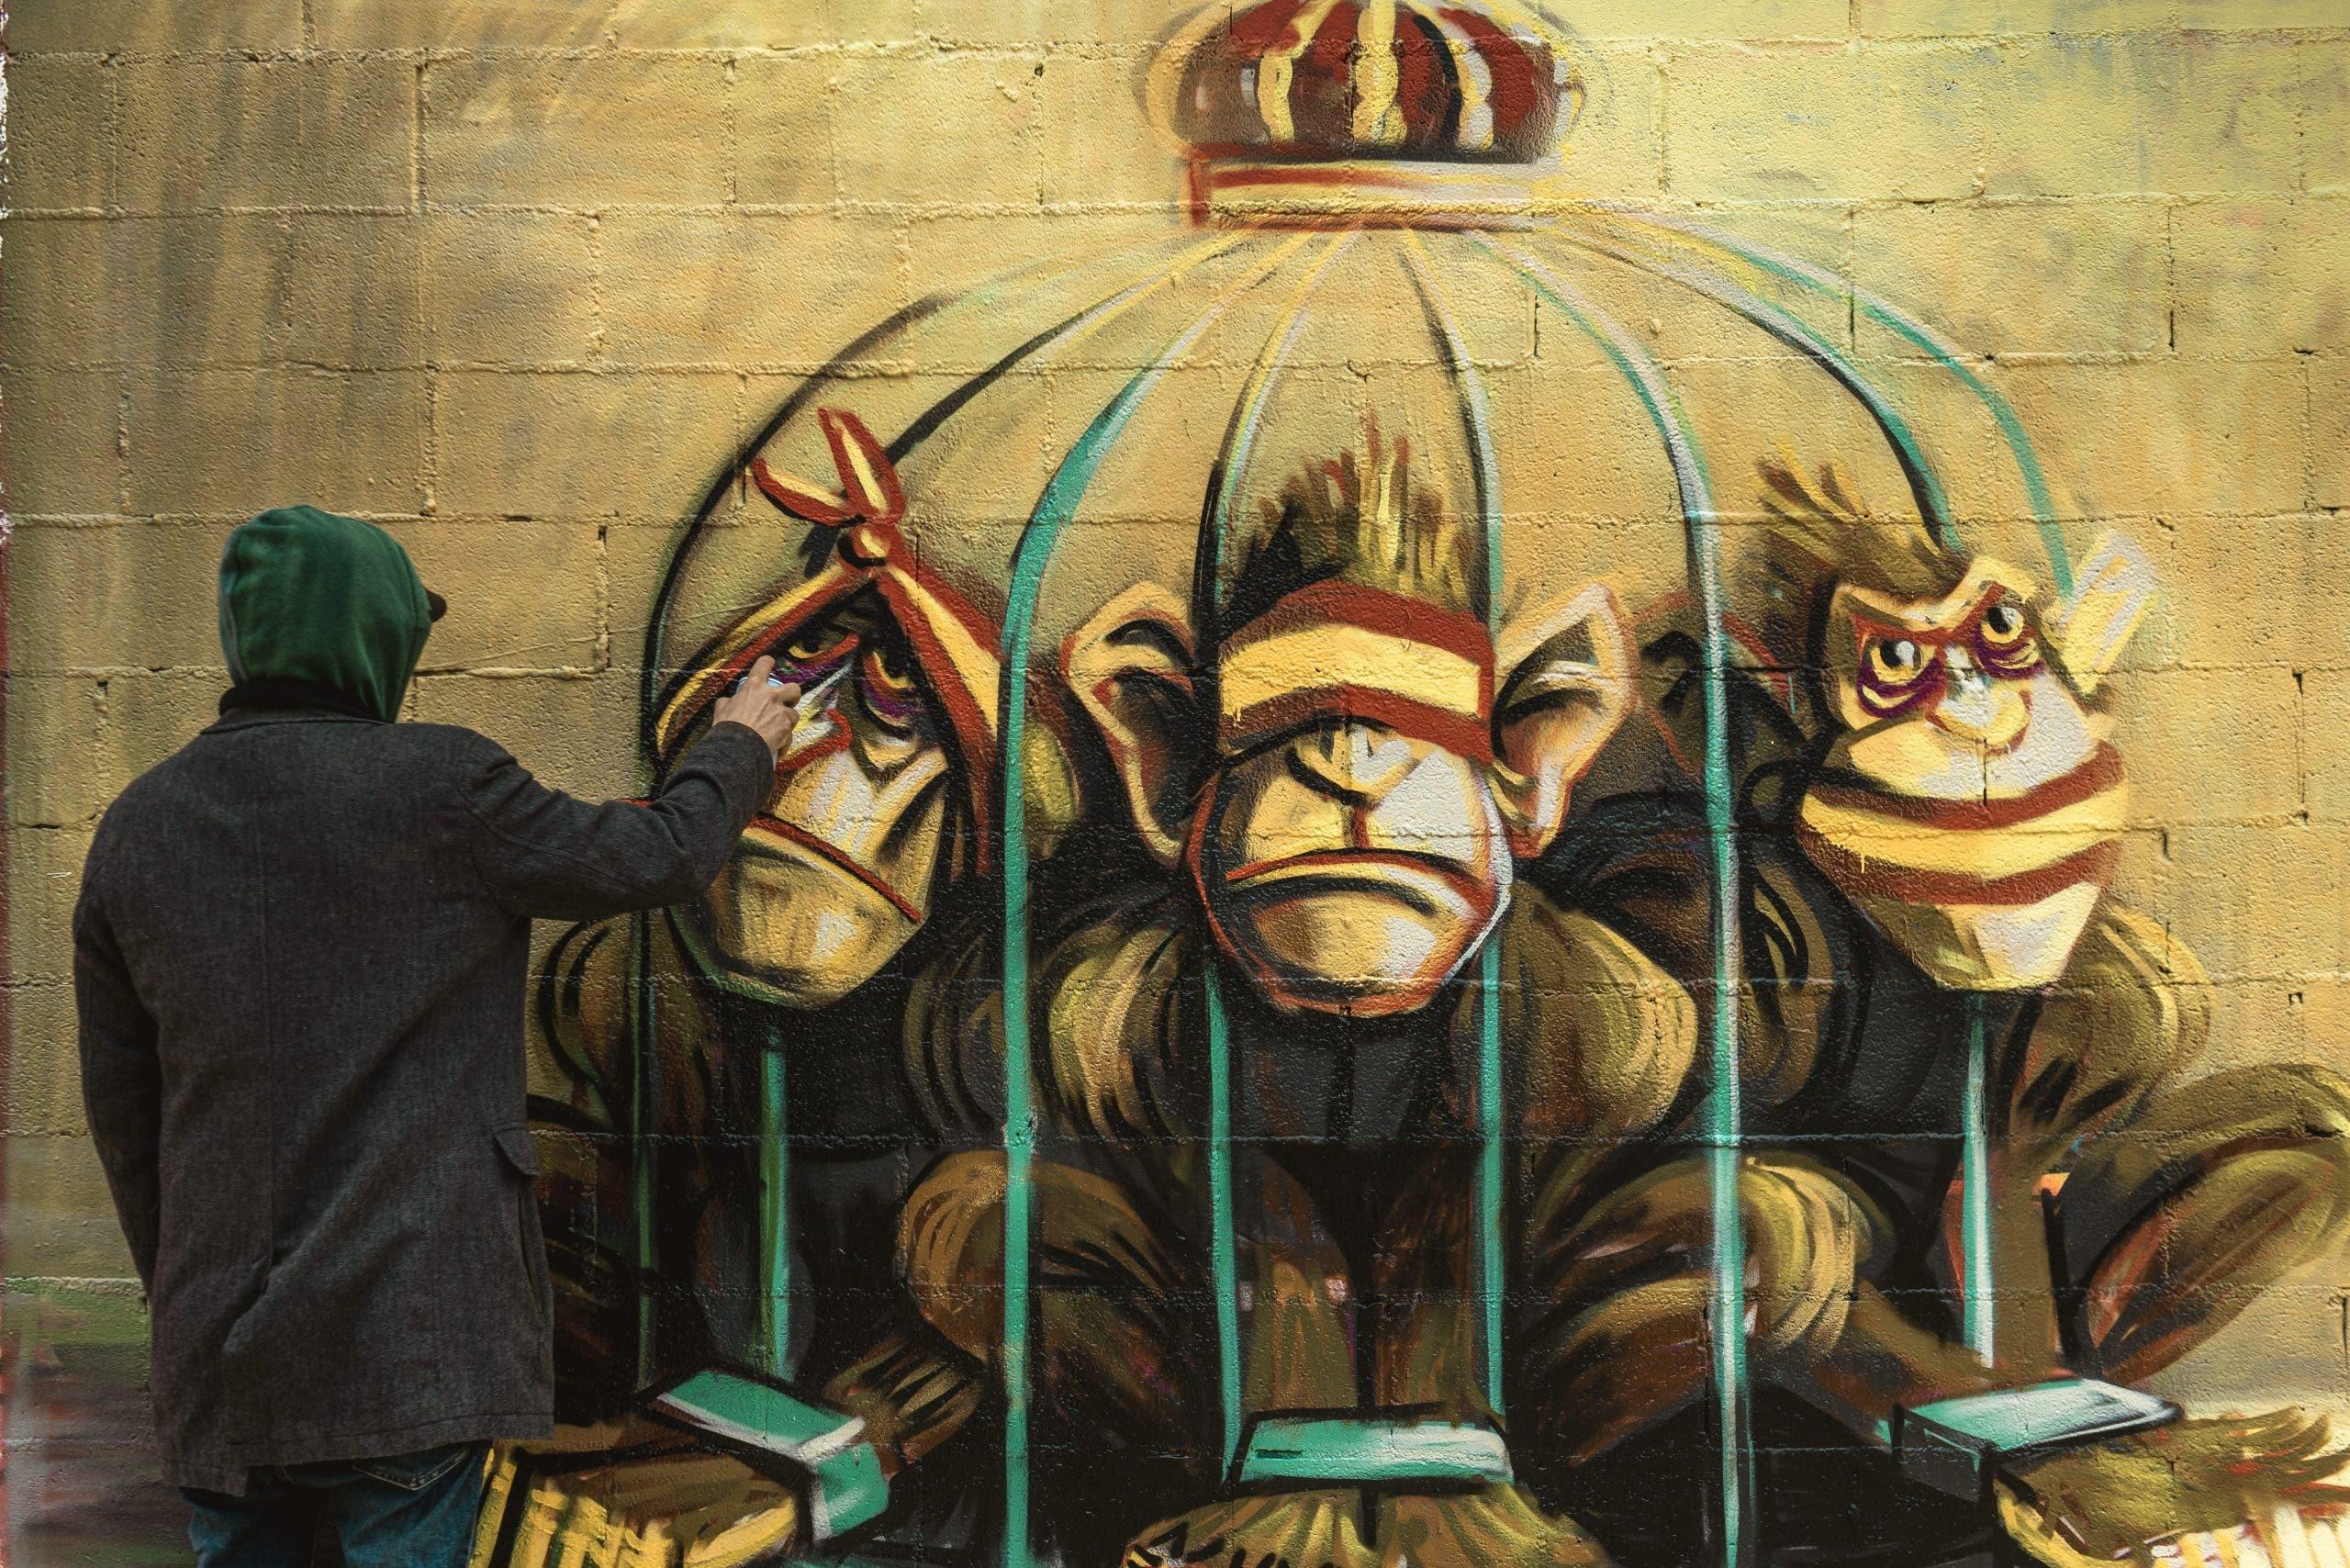 Graffiti criticising the Spanish monarchy